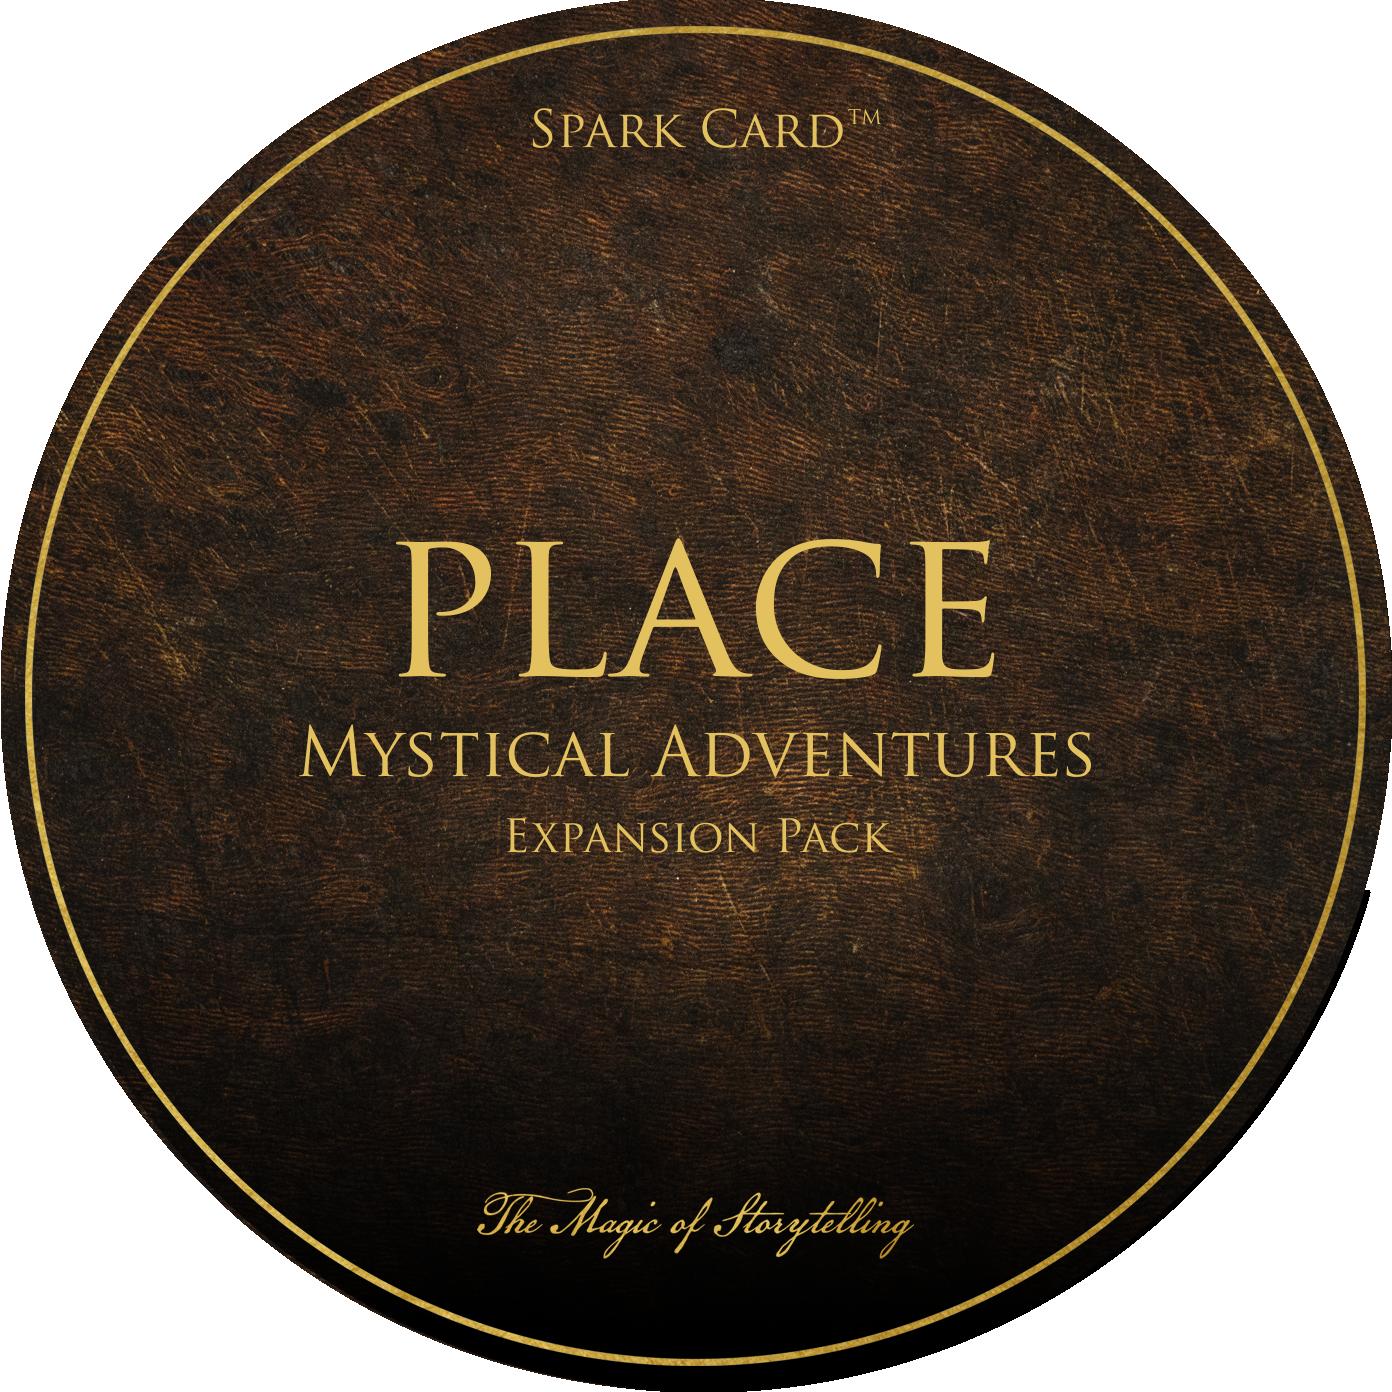 SparkCard_Plot_Place2.png